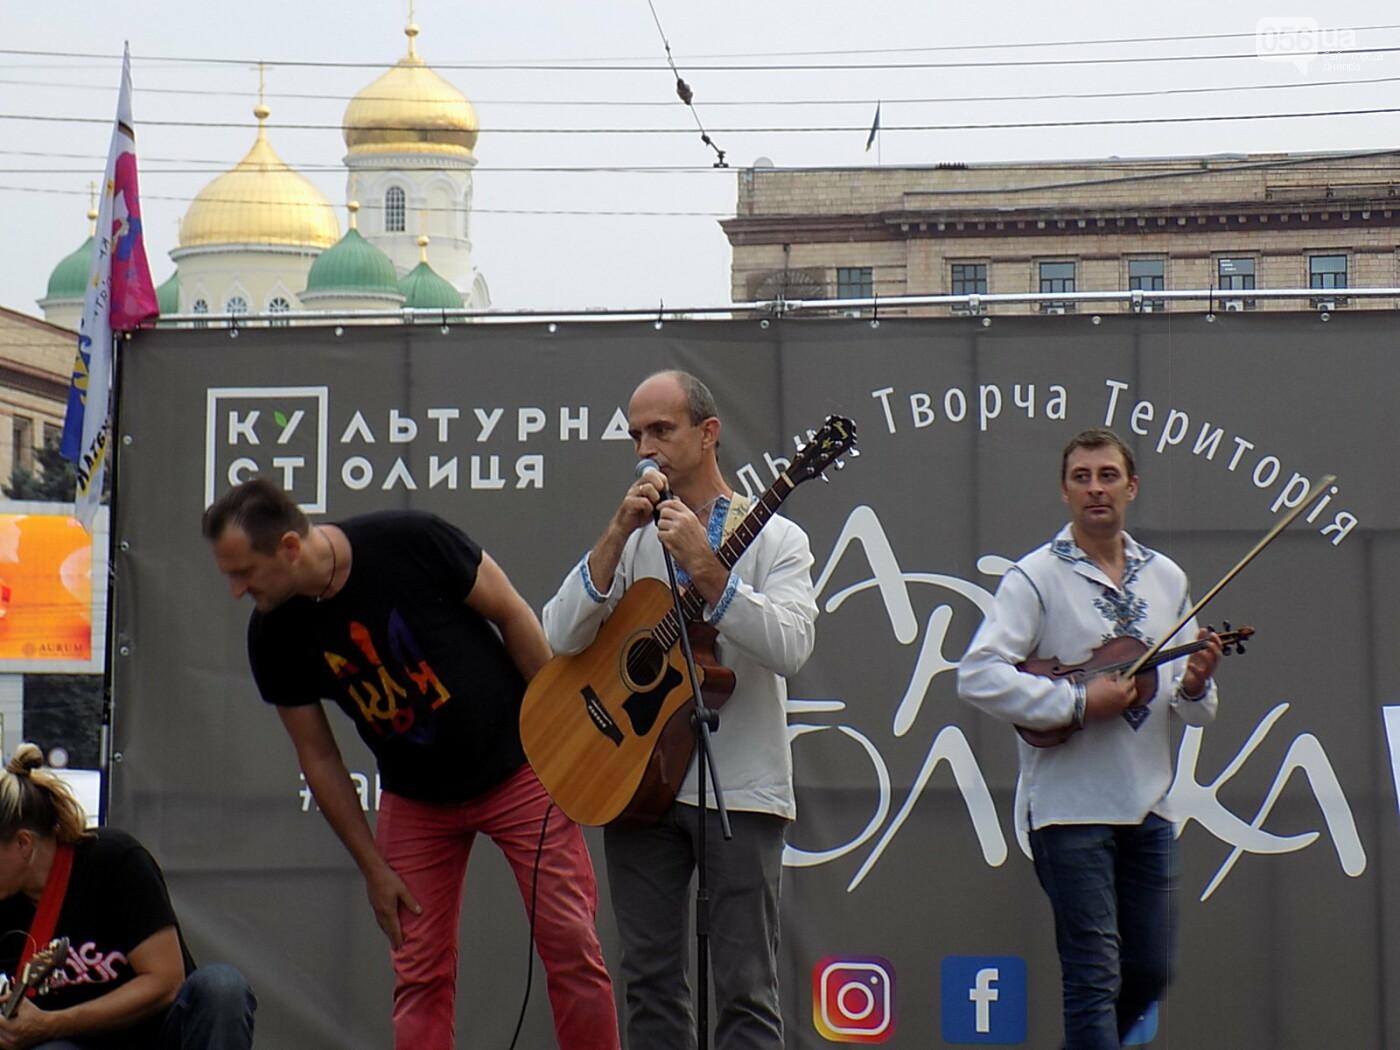 """Мова єднає Дніпро"": в центре города прошла символическая акция с концертом и подарками, - ФОТО, фото-12"